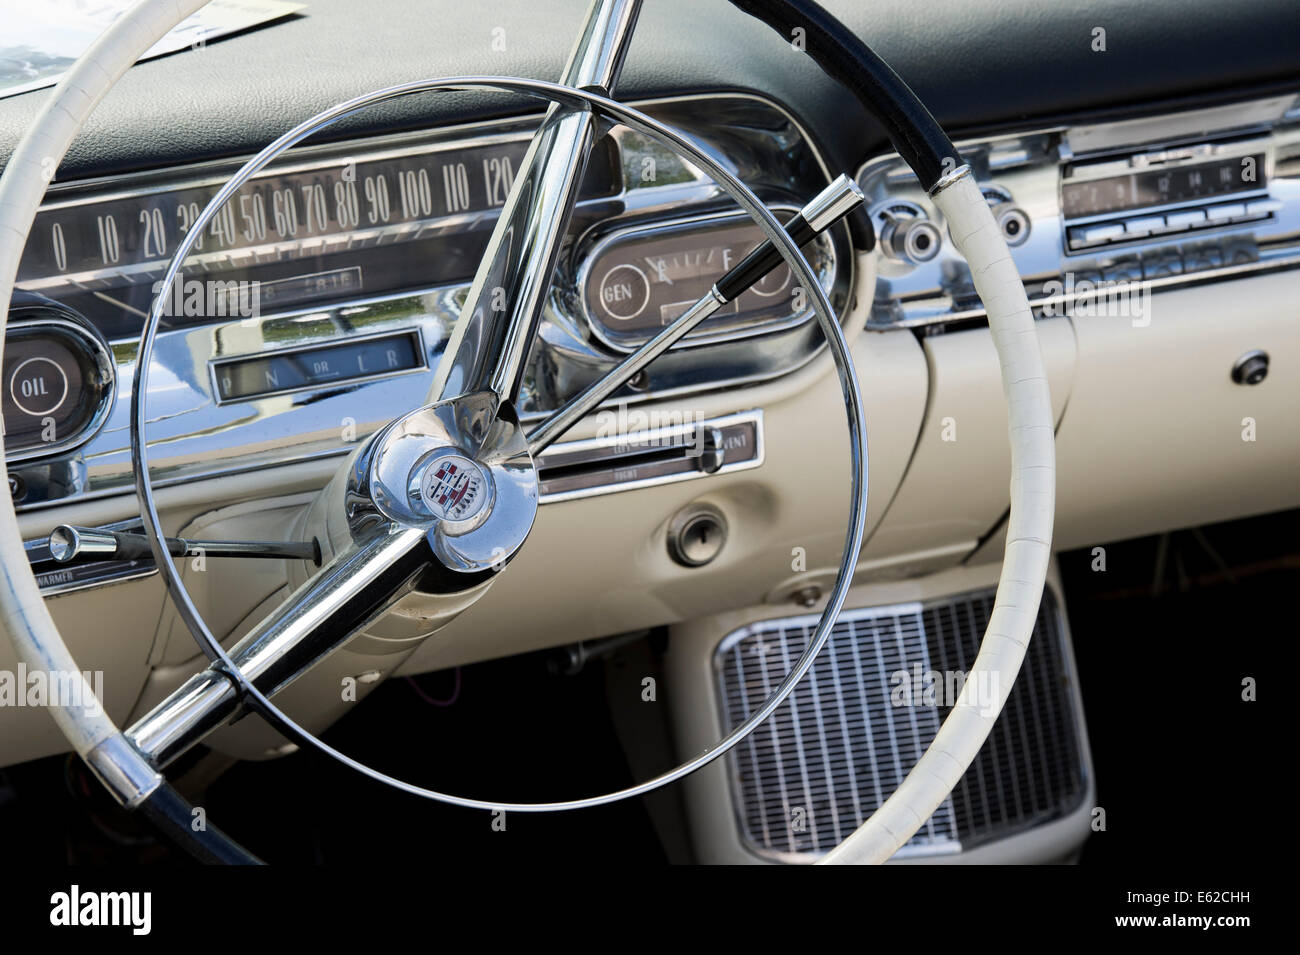 Armaturenbrett oldtimer  1950er Jahre Cadillac Armaturenbrett und Innenraum abstrakt ...